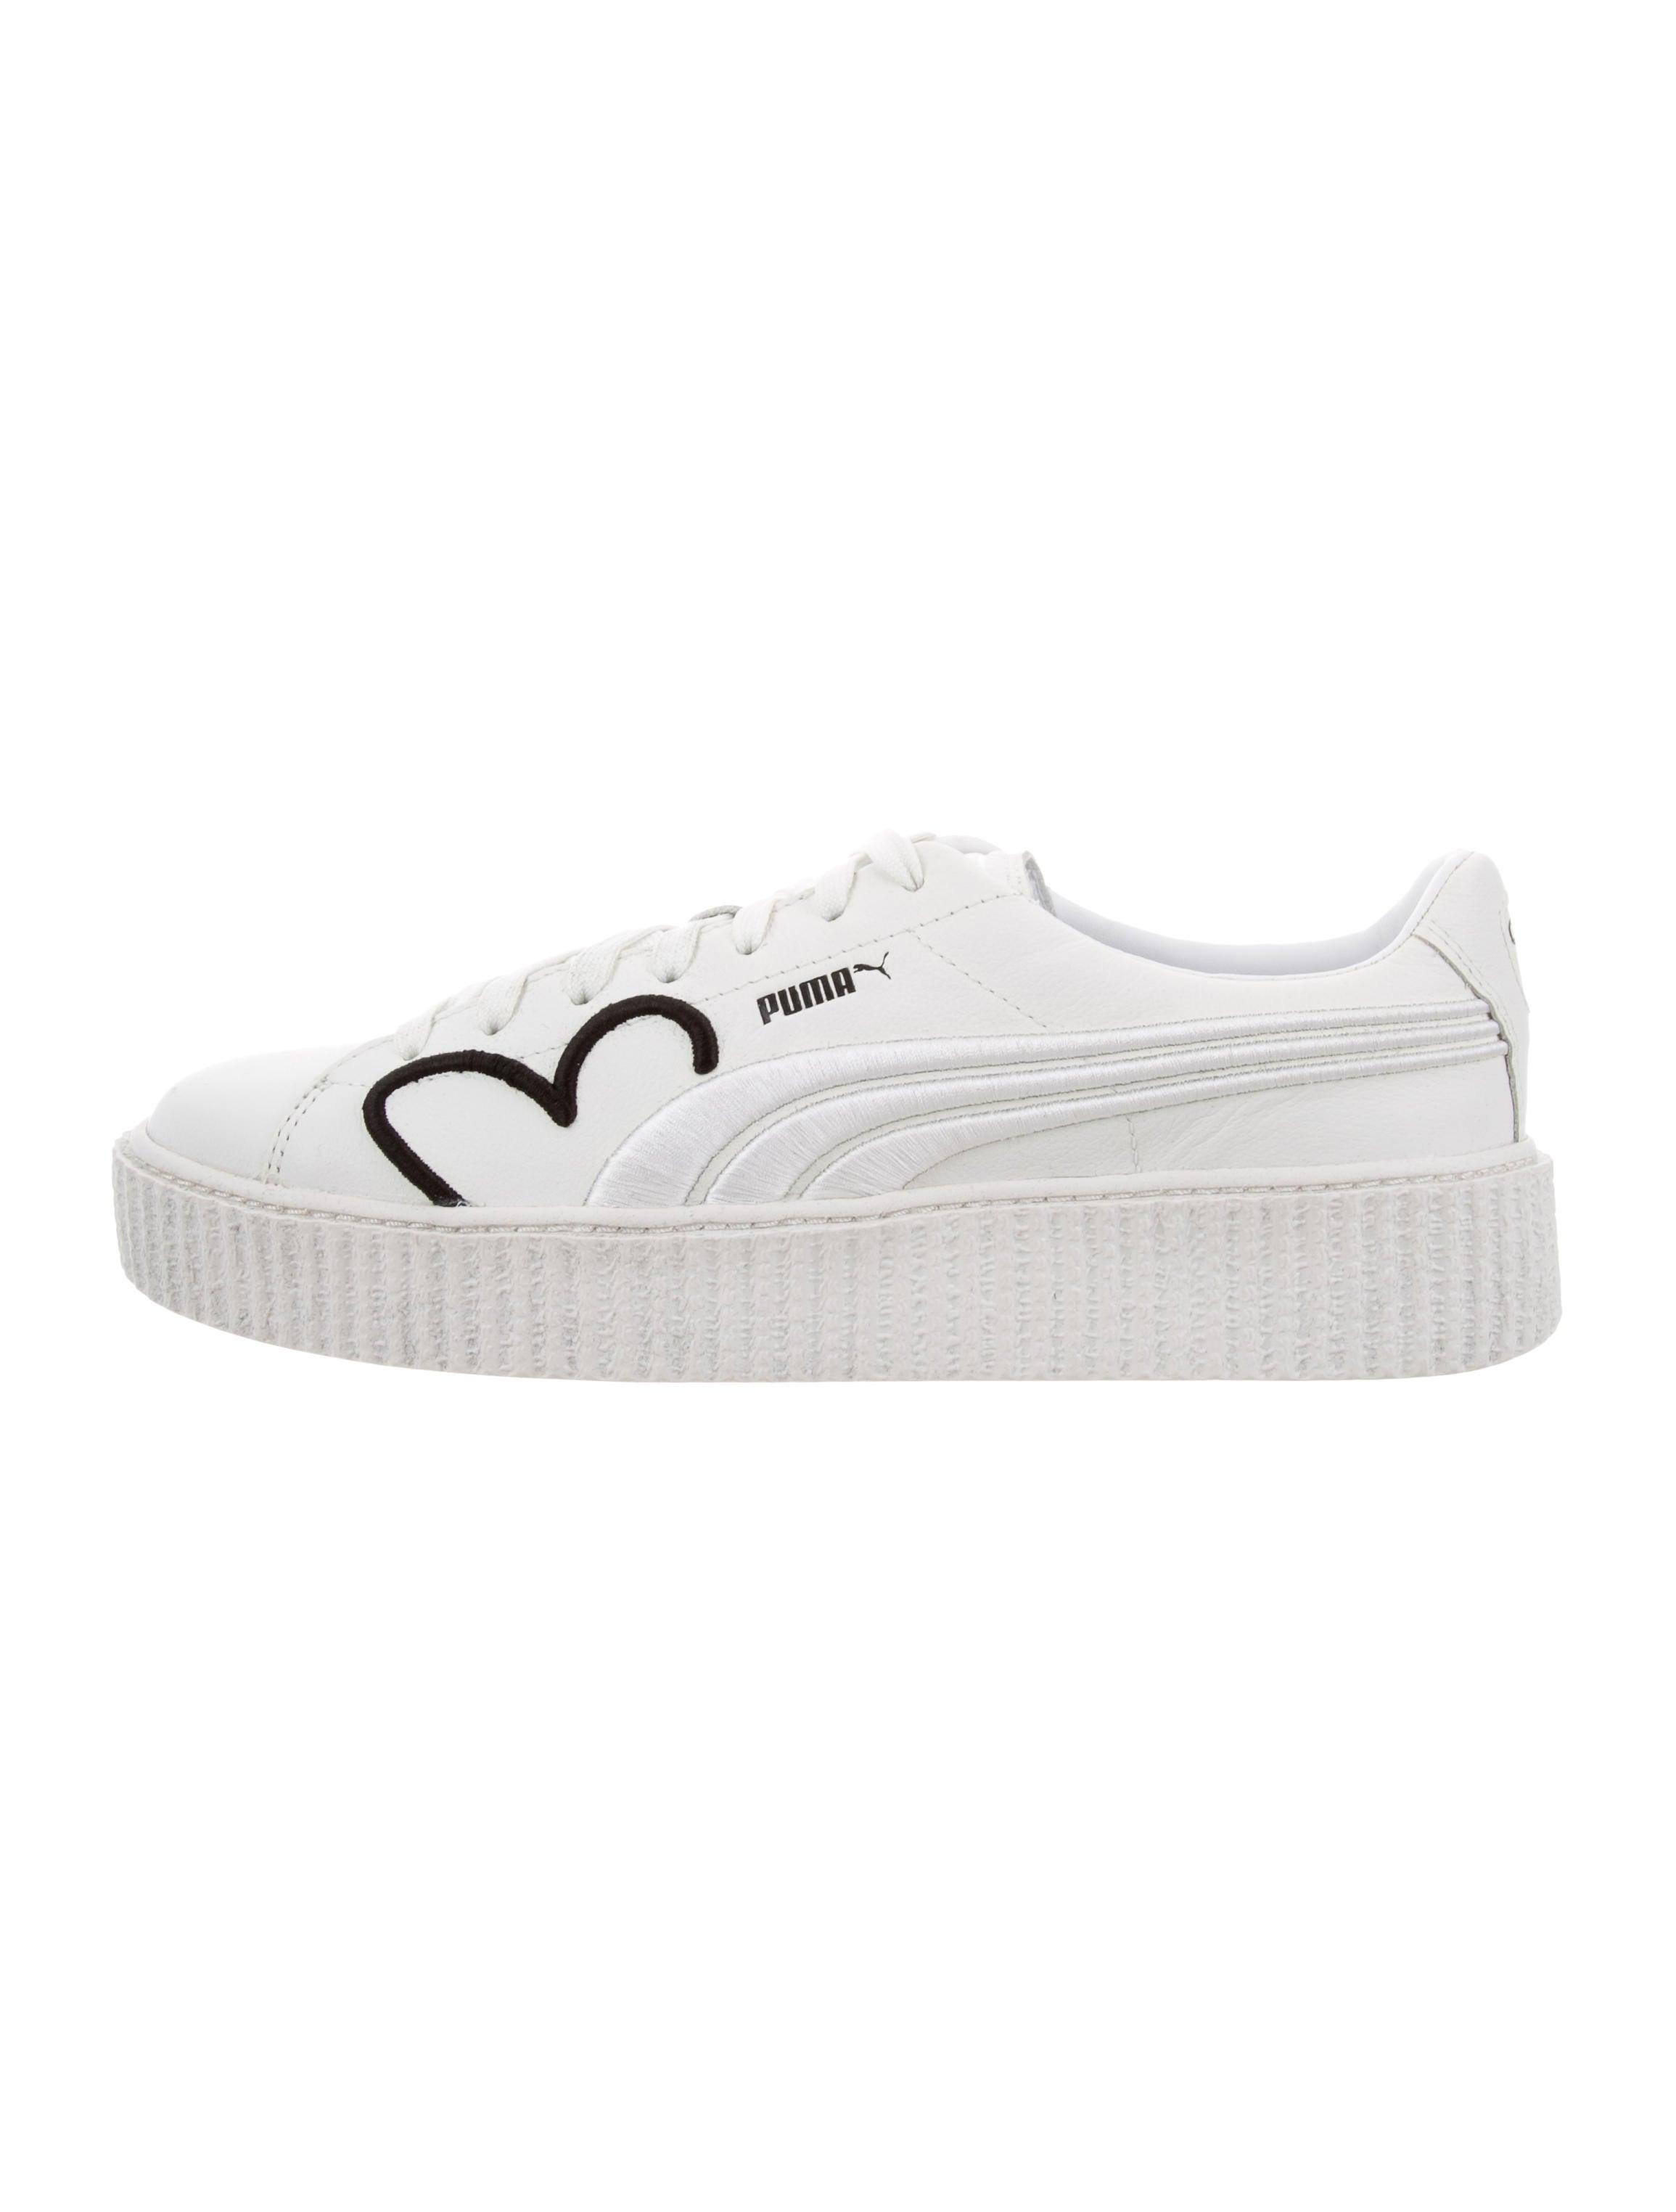 Fenty x Puma Clara Lionel Creeper Sneakers - Shoes - WPMFY20783 ... 1682bd31e